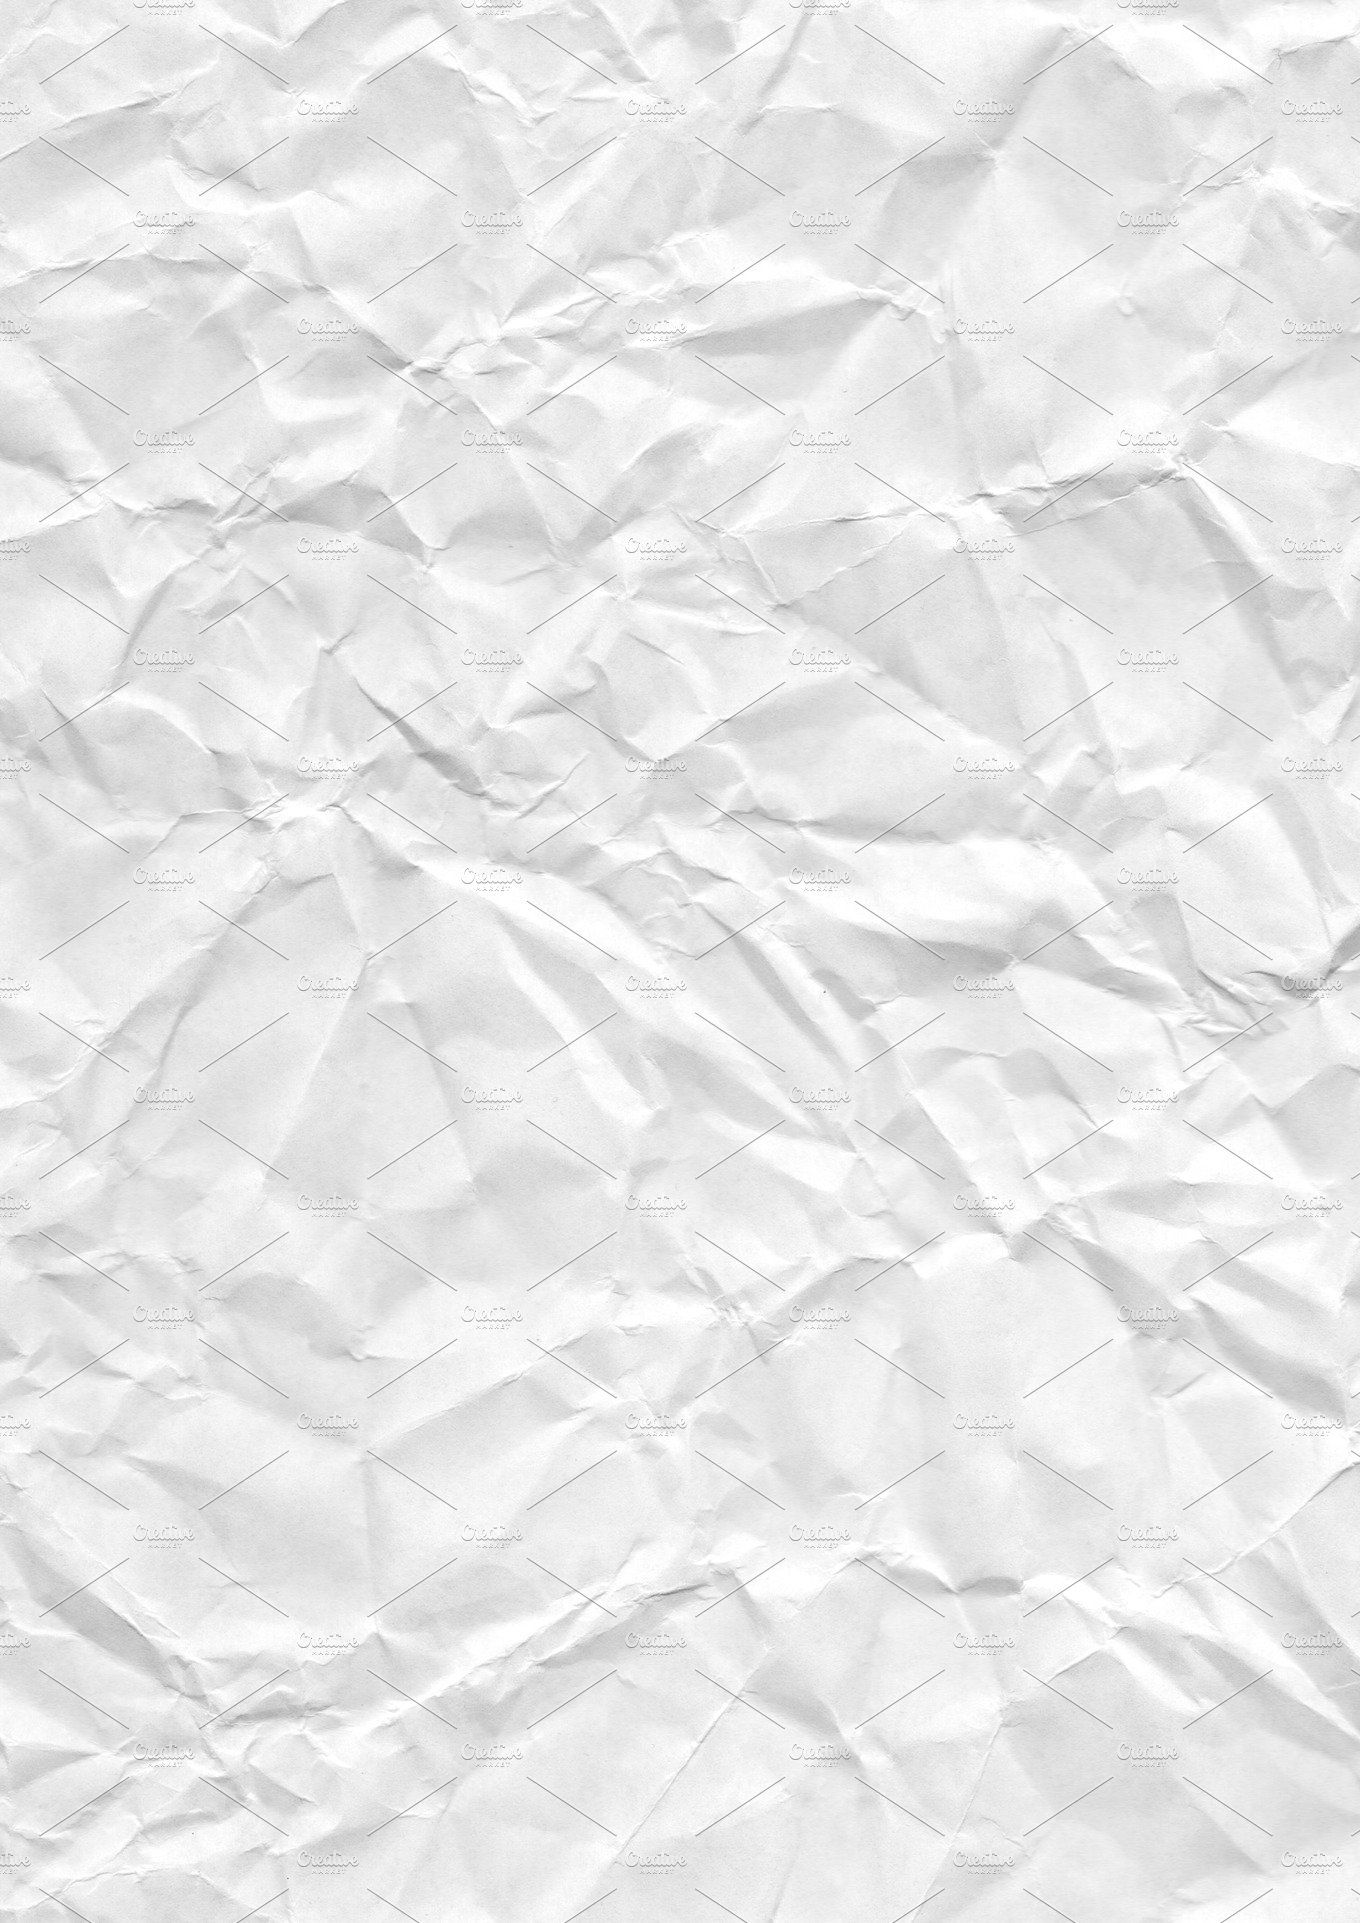 Crumpled Paper Paper Background Design Crumpled Paper Crumpled Paper Background